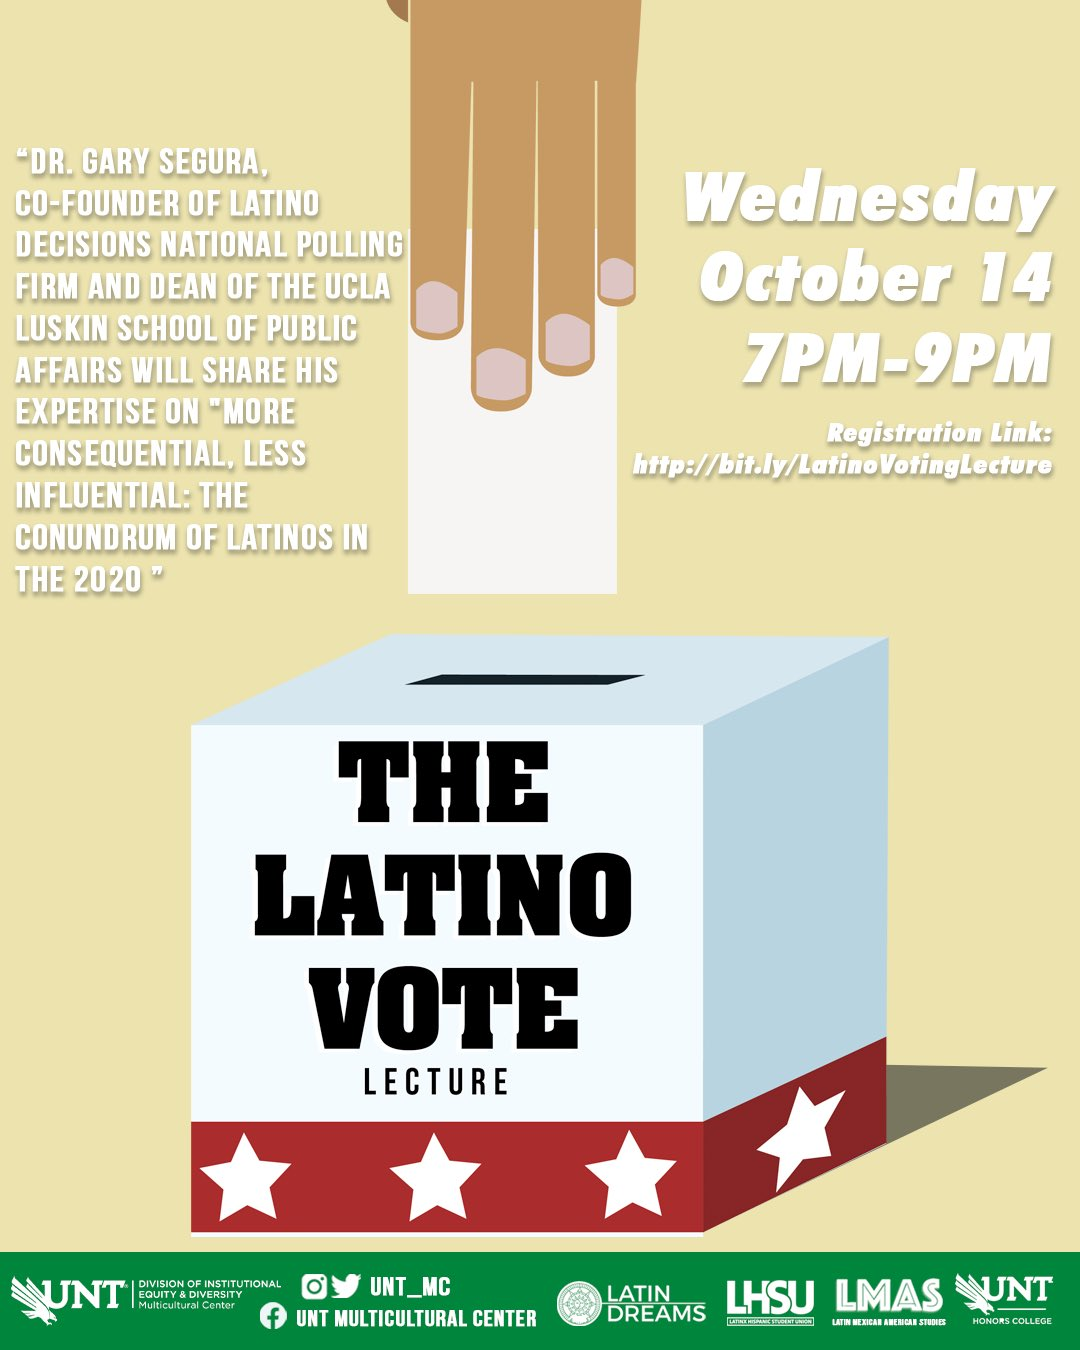 The Latin Vote MC event